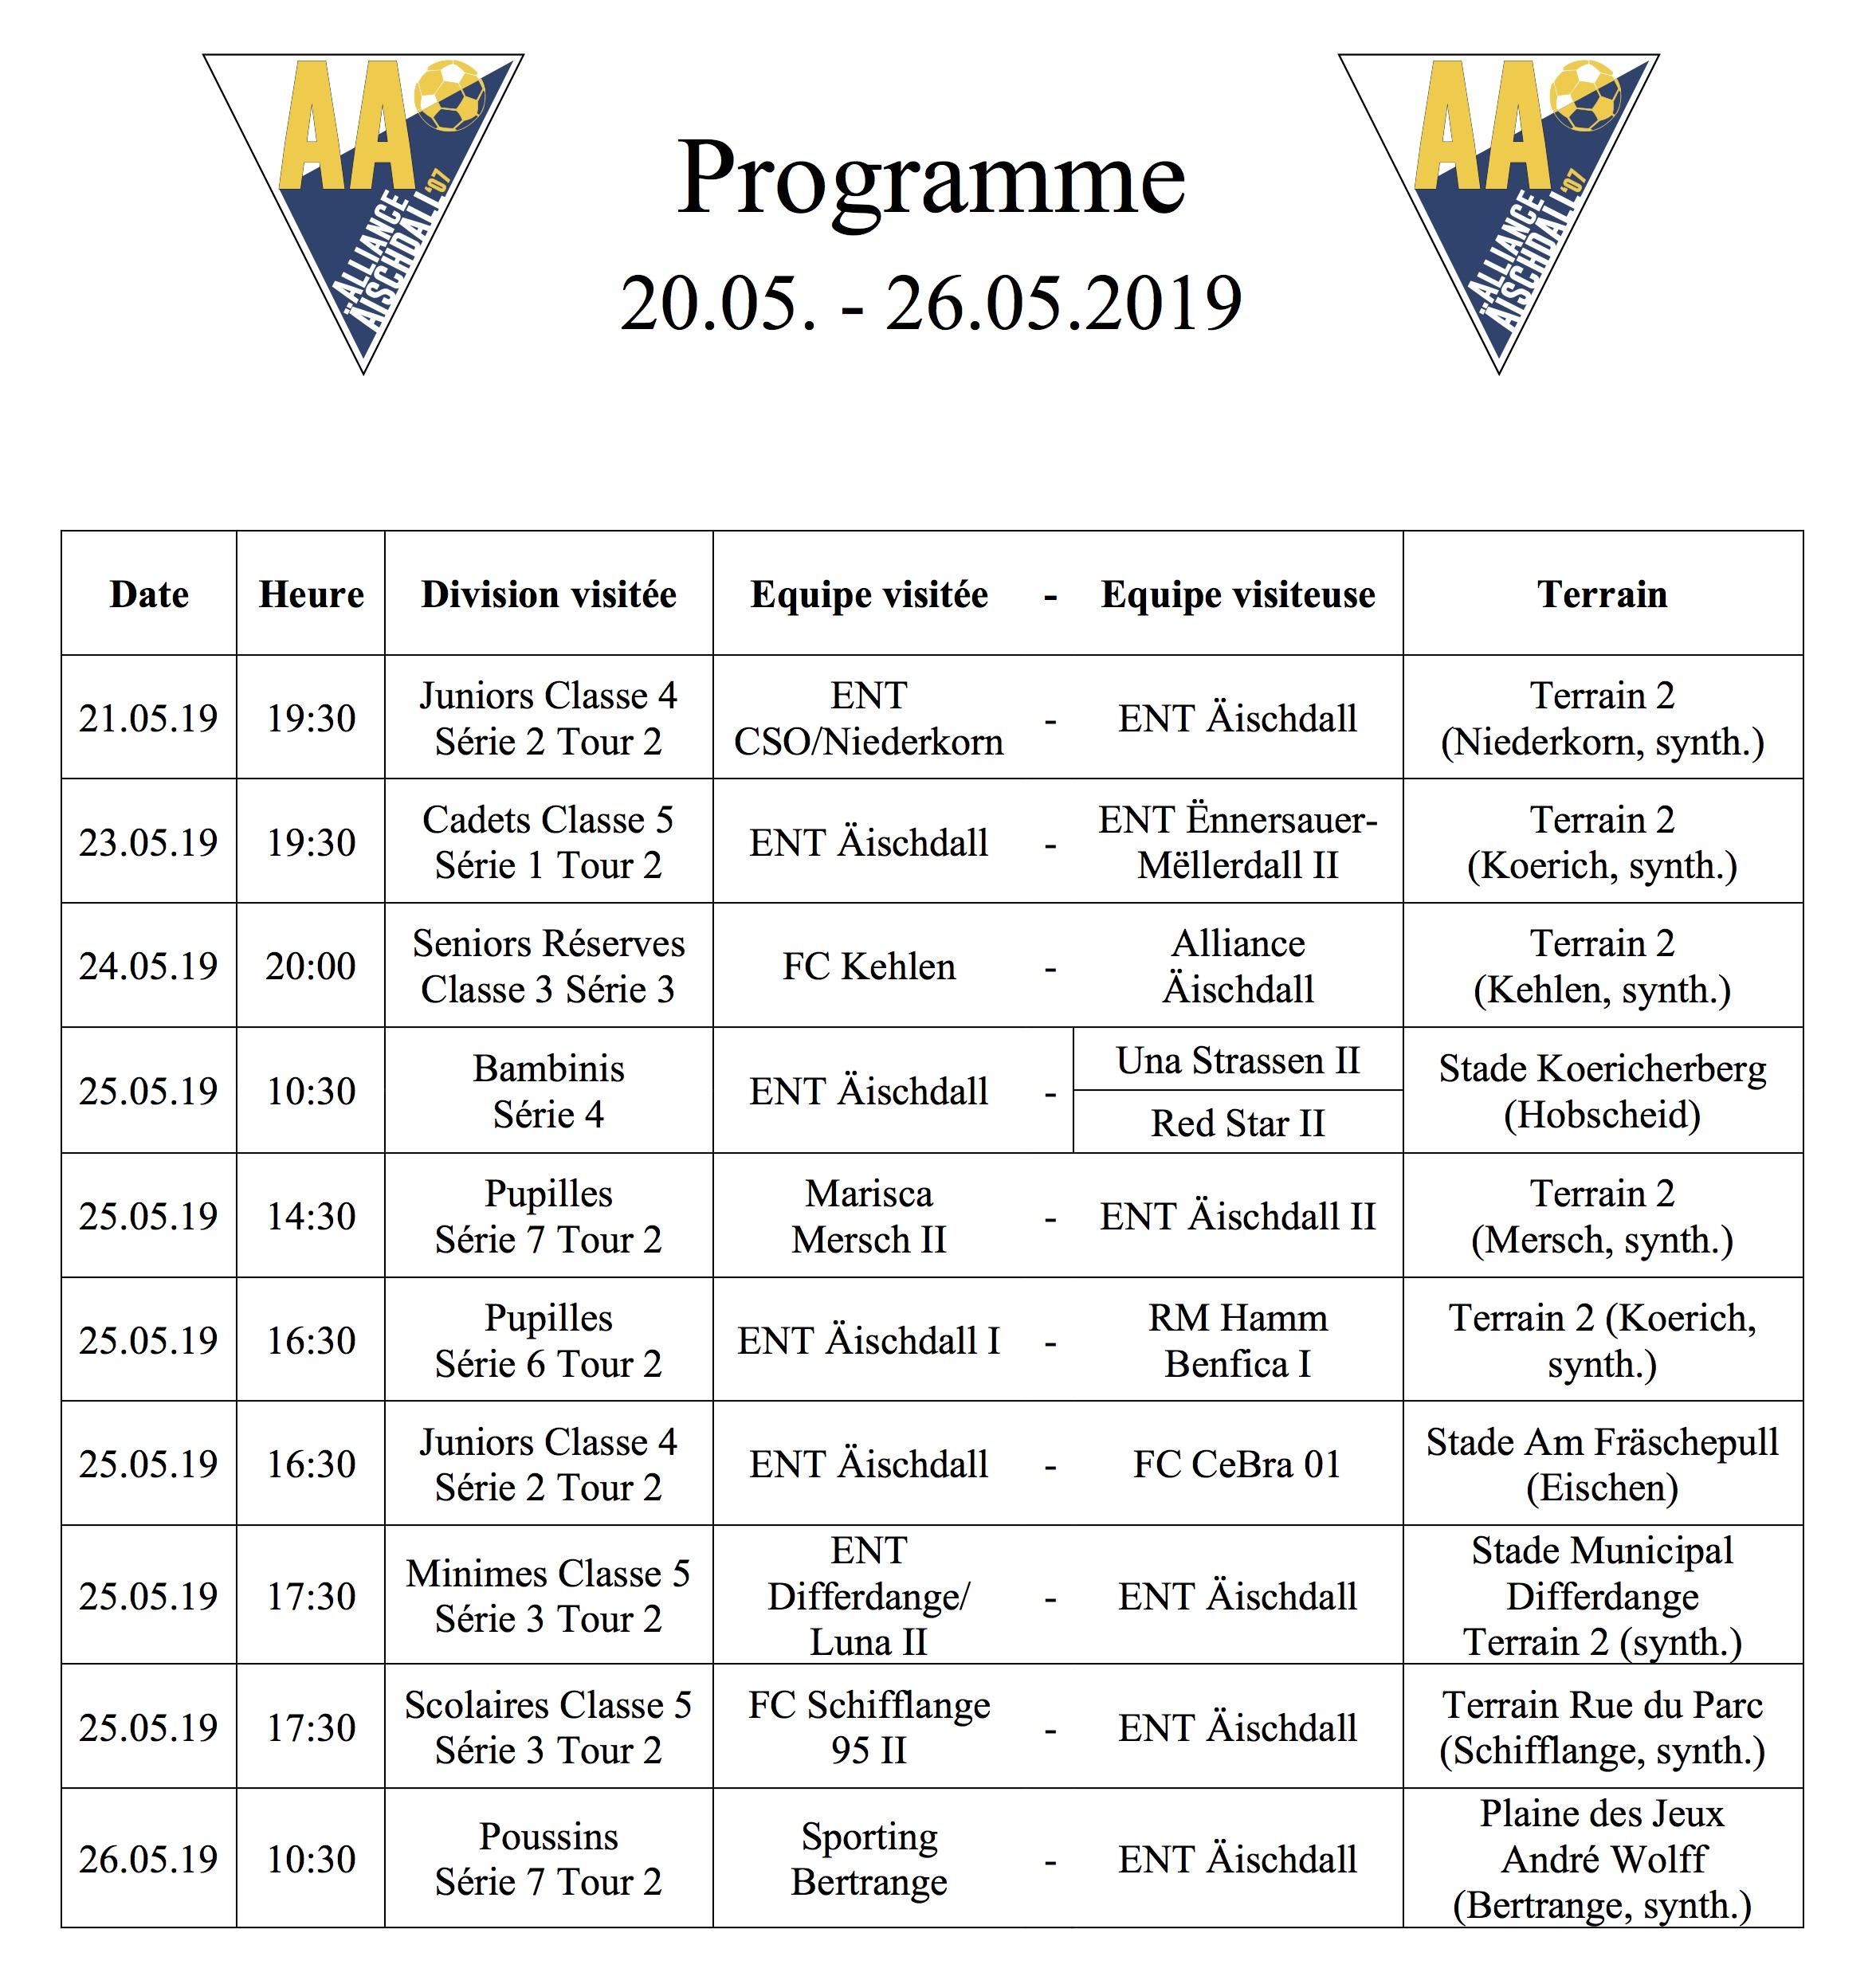 Programm 20.05.-26.05.2019